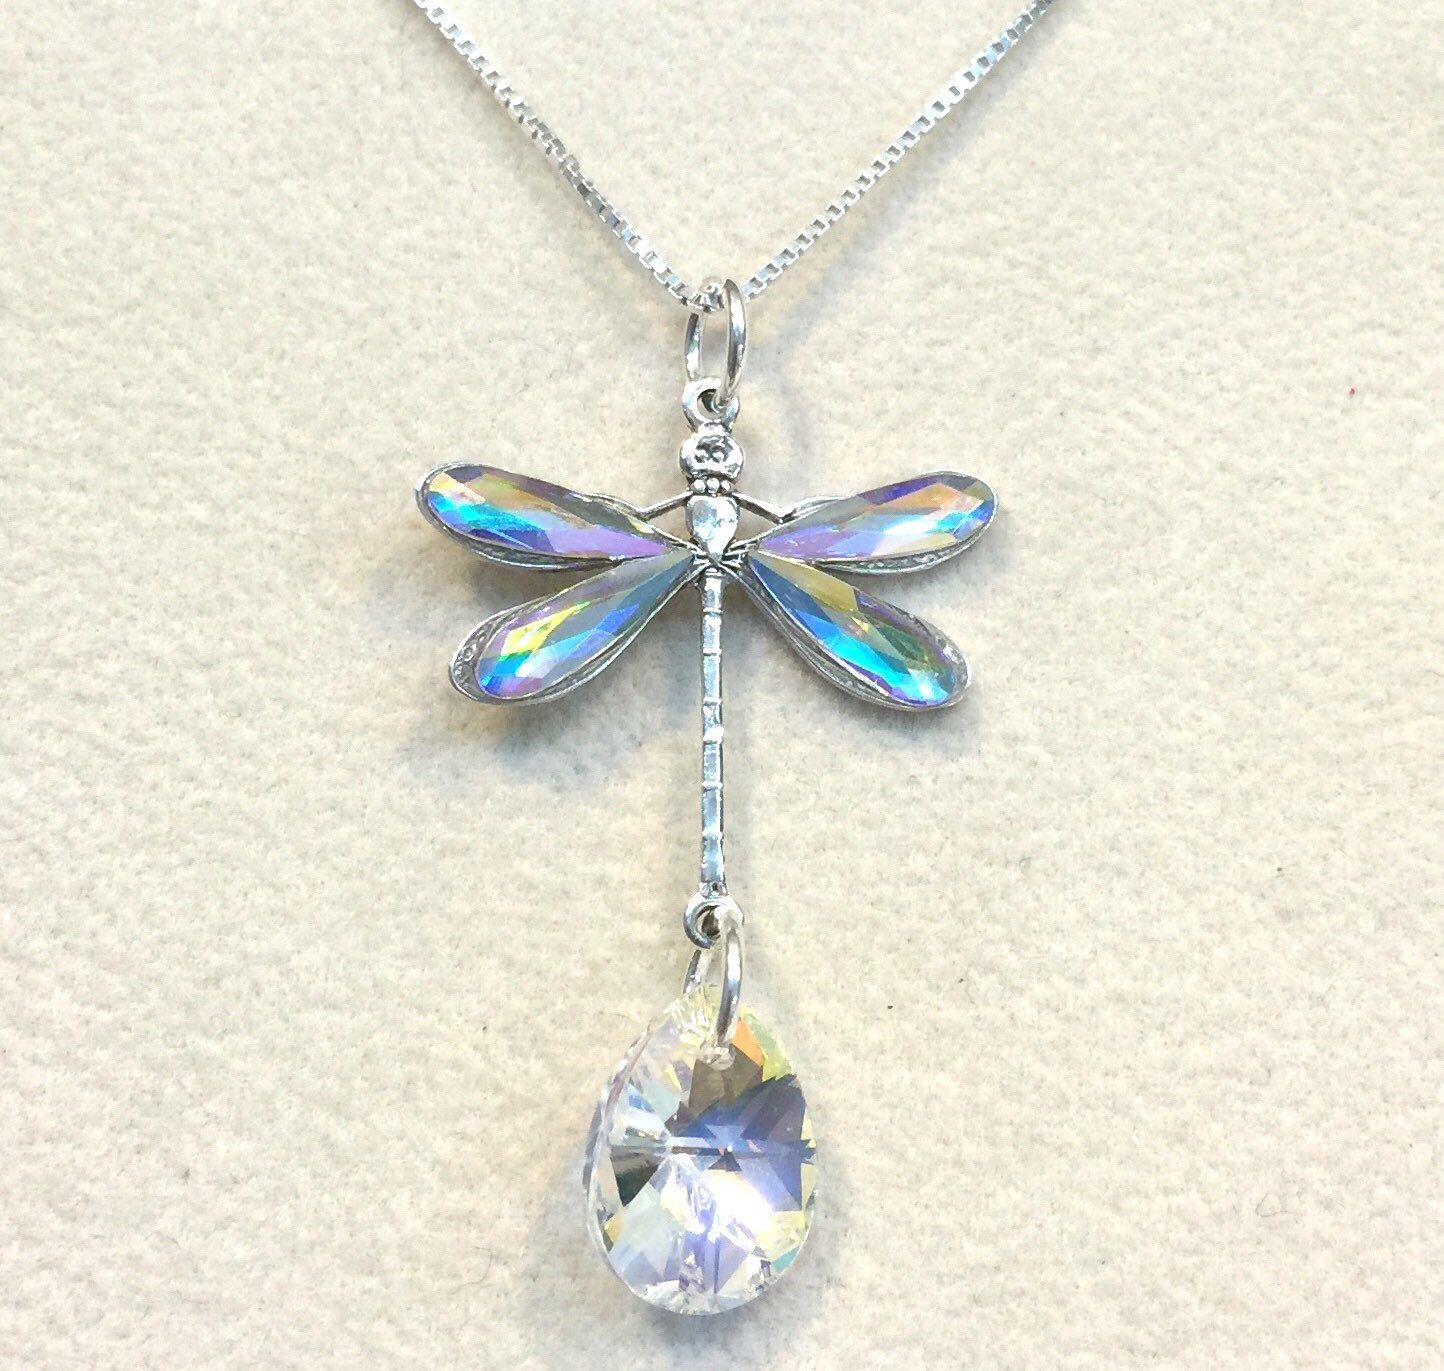 DIY jewelry, making Dragonfly pendant using Swarowski crystals